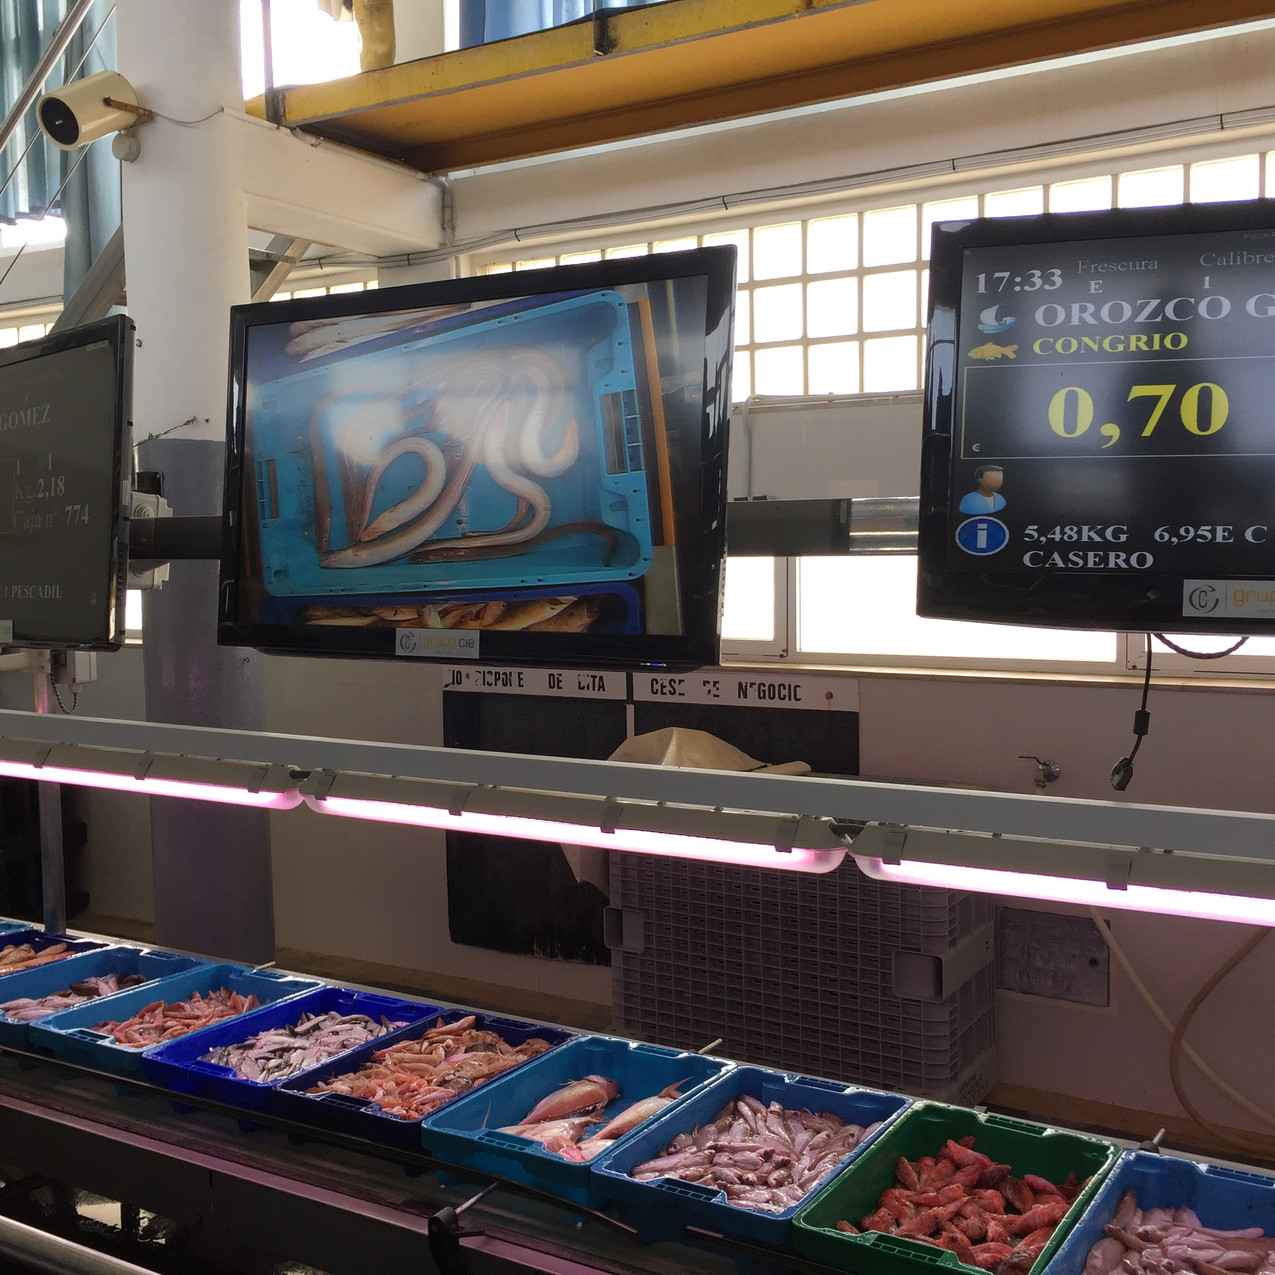 Fish auction under way